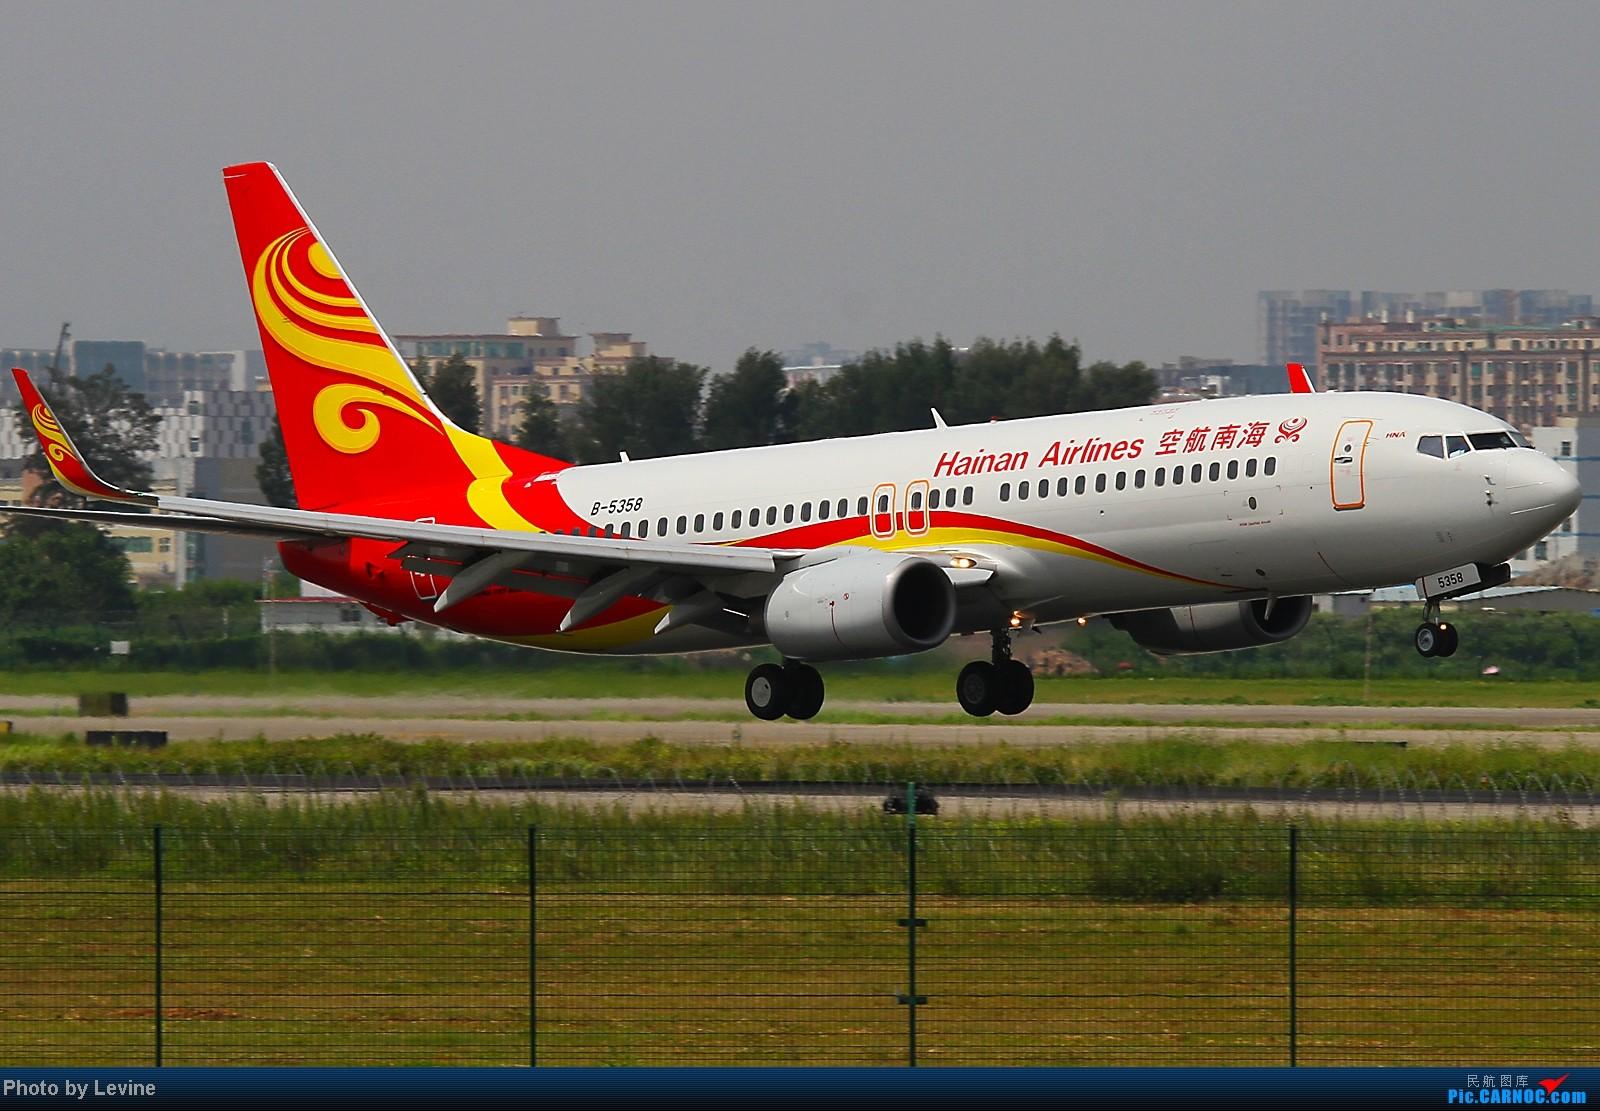 Re:[转贴][深圳飞友会]夏天第一拍 小试牛刀 BOEING 737-800 B-5358 中国深圳宝安机场